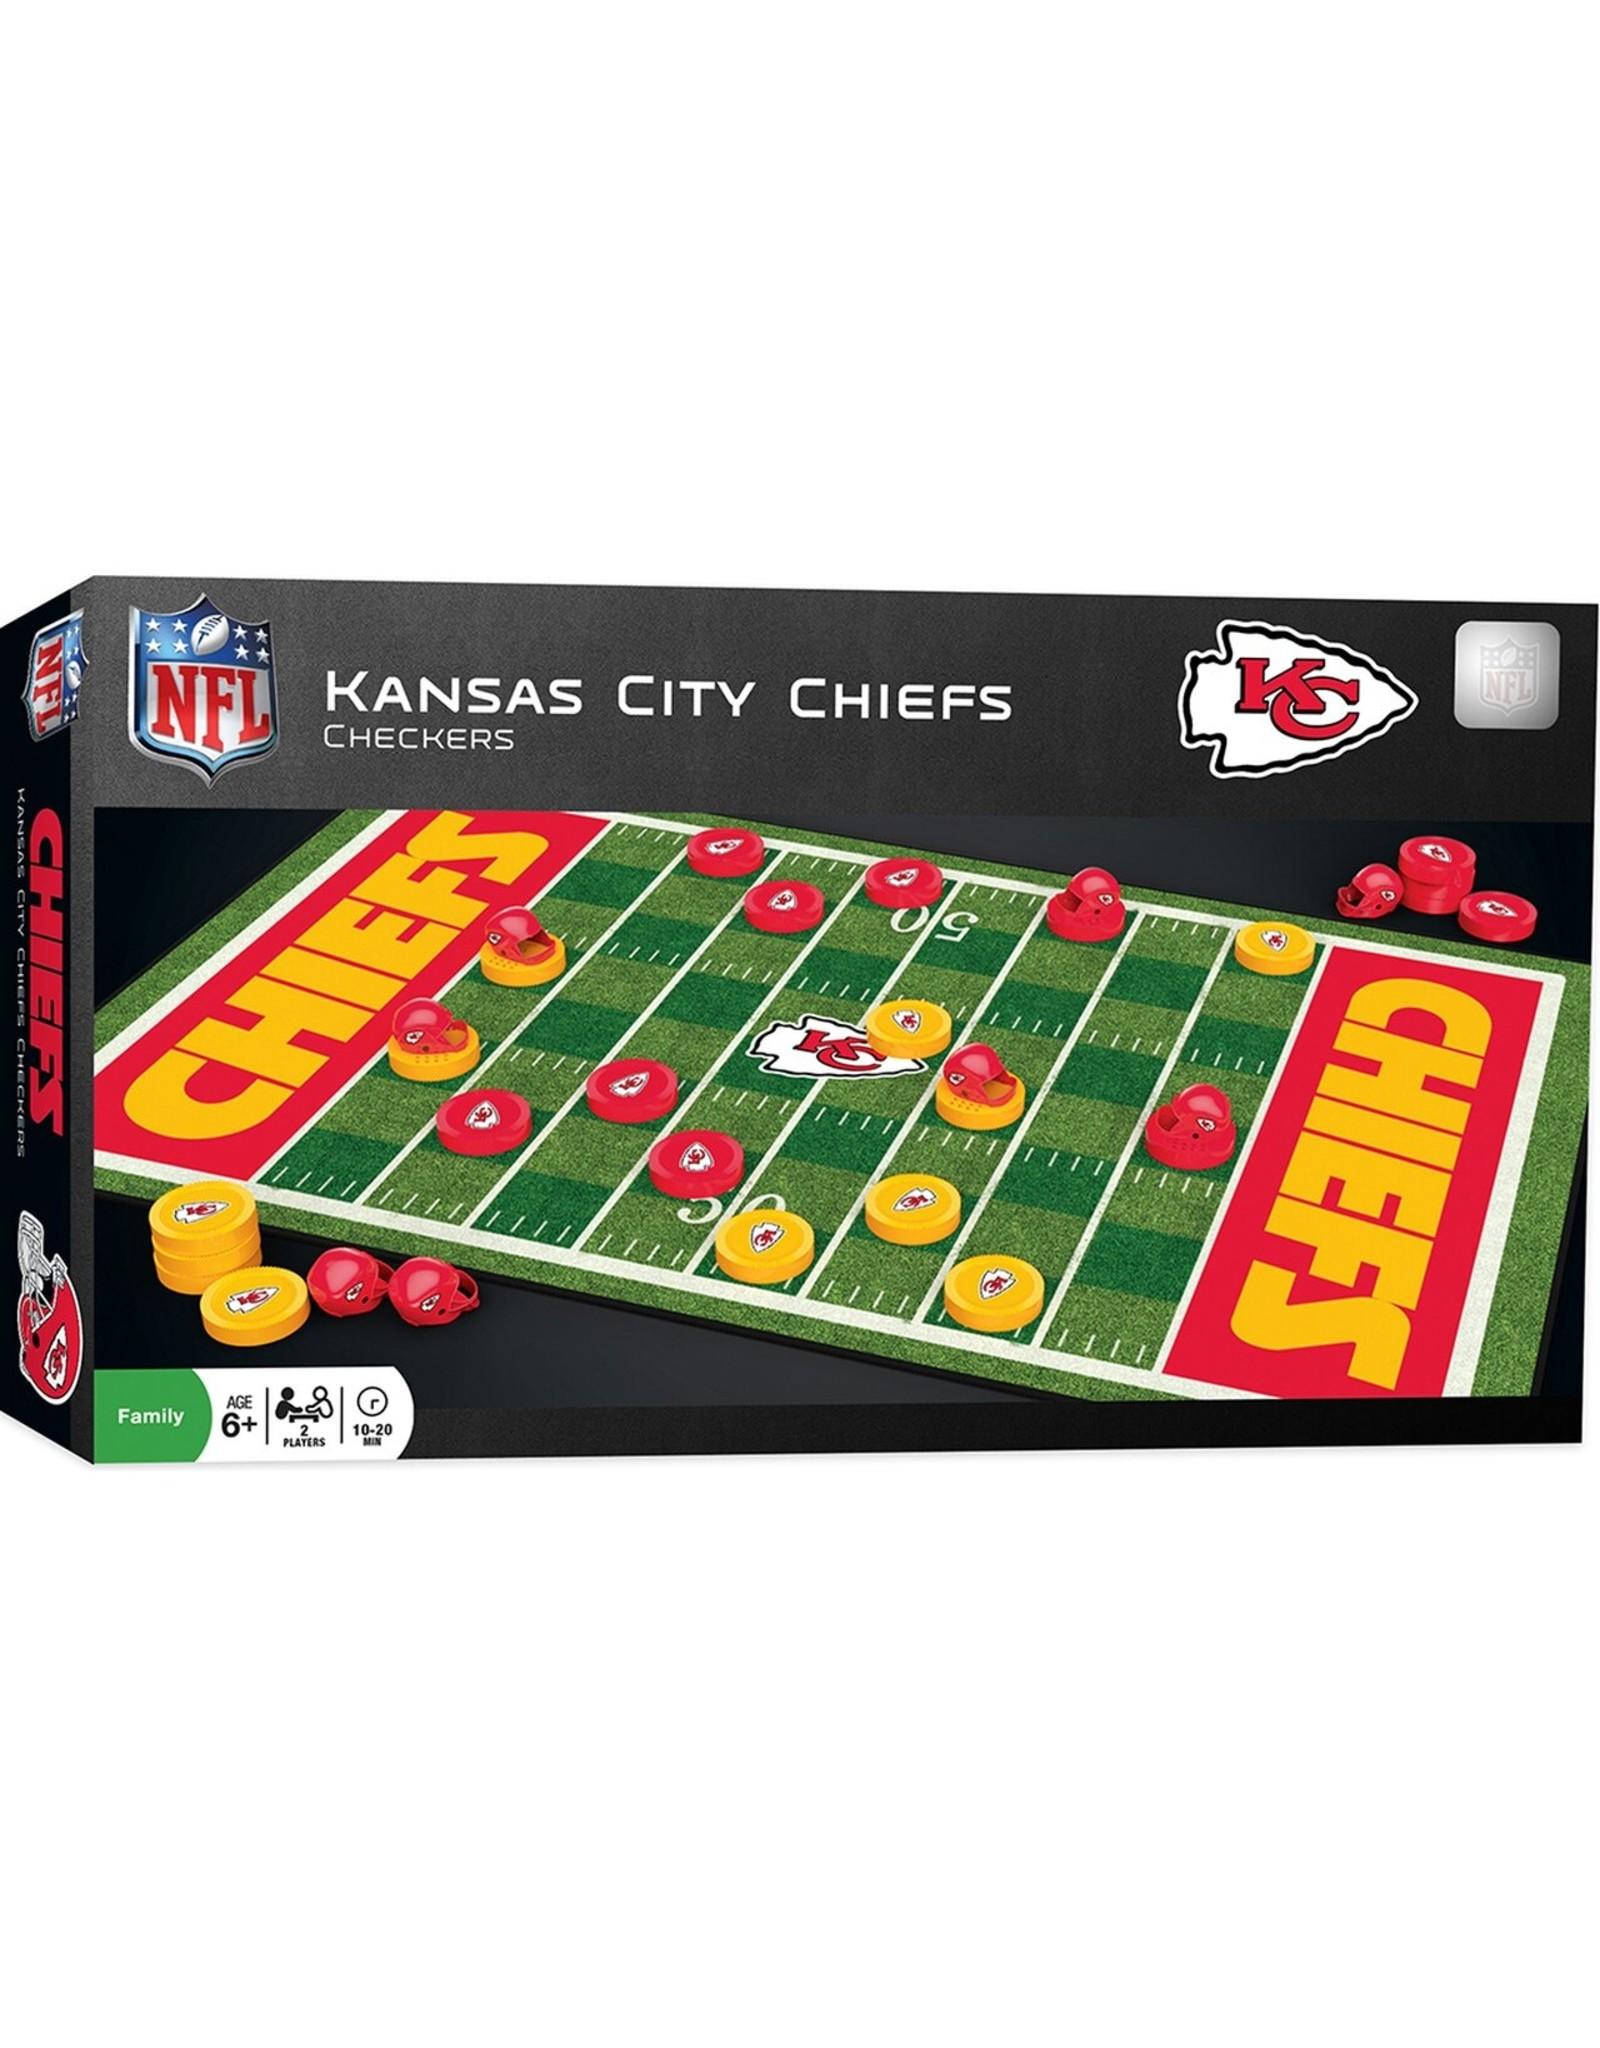 Masterpiece Kansas City Chiefs Checkers